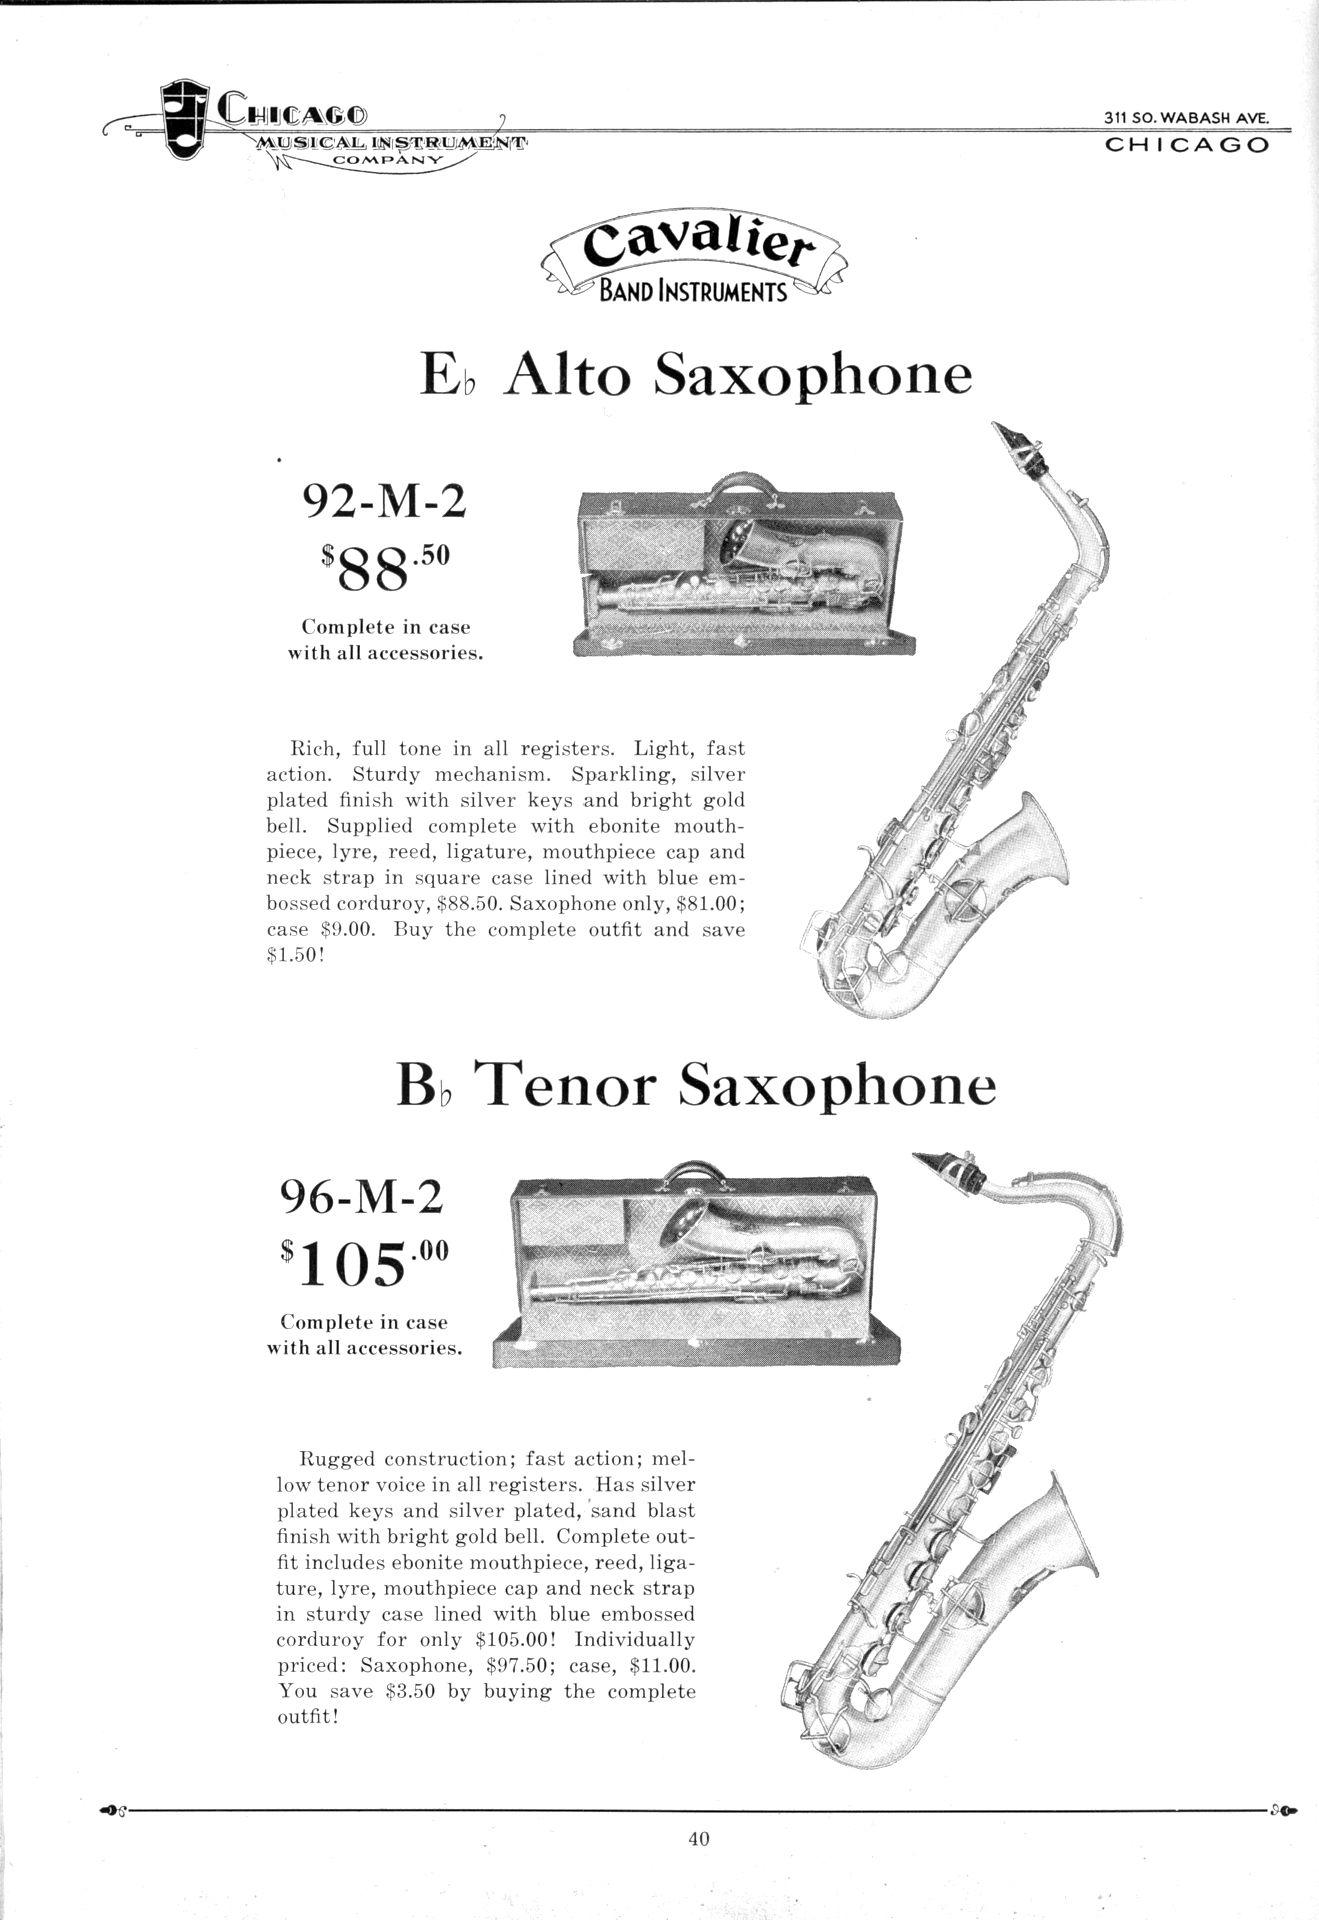 Cavalier Band Instruments, vintage catalogue, 1931, Cavalier saxophones, Pan American, Conn, Chicago Musical Instrument Company, 92M, alto saxophone, 96M, tenor saxophone